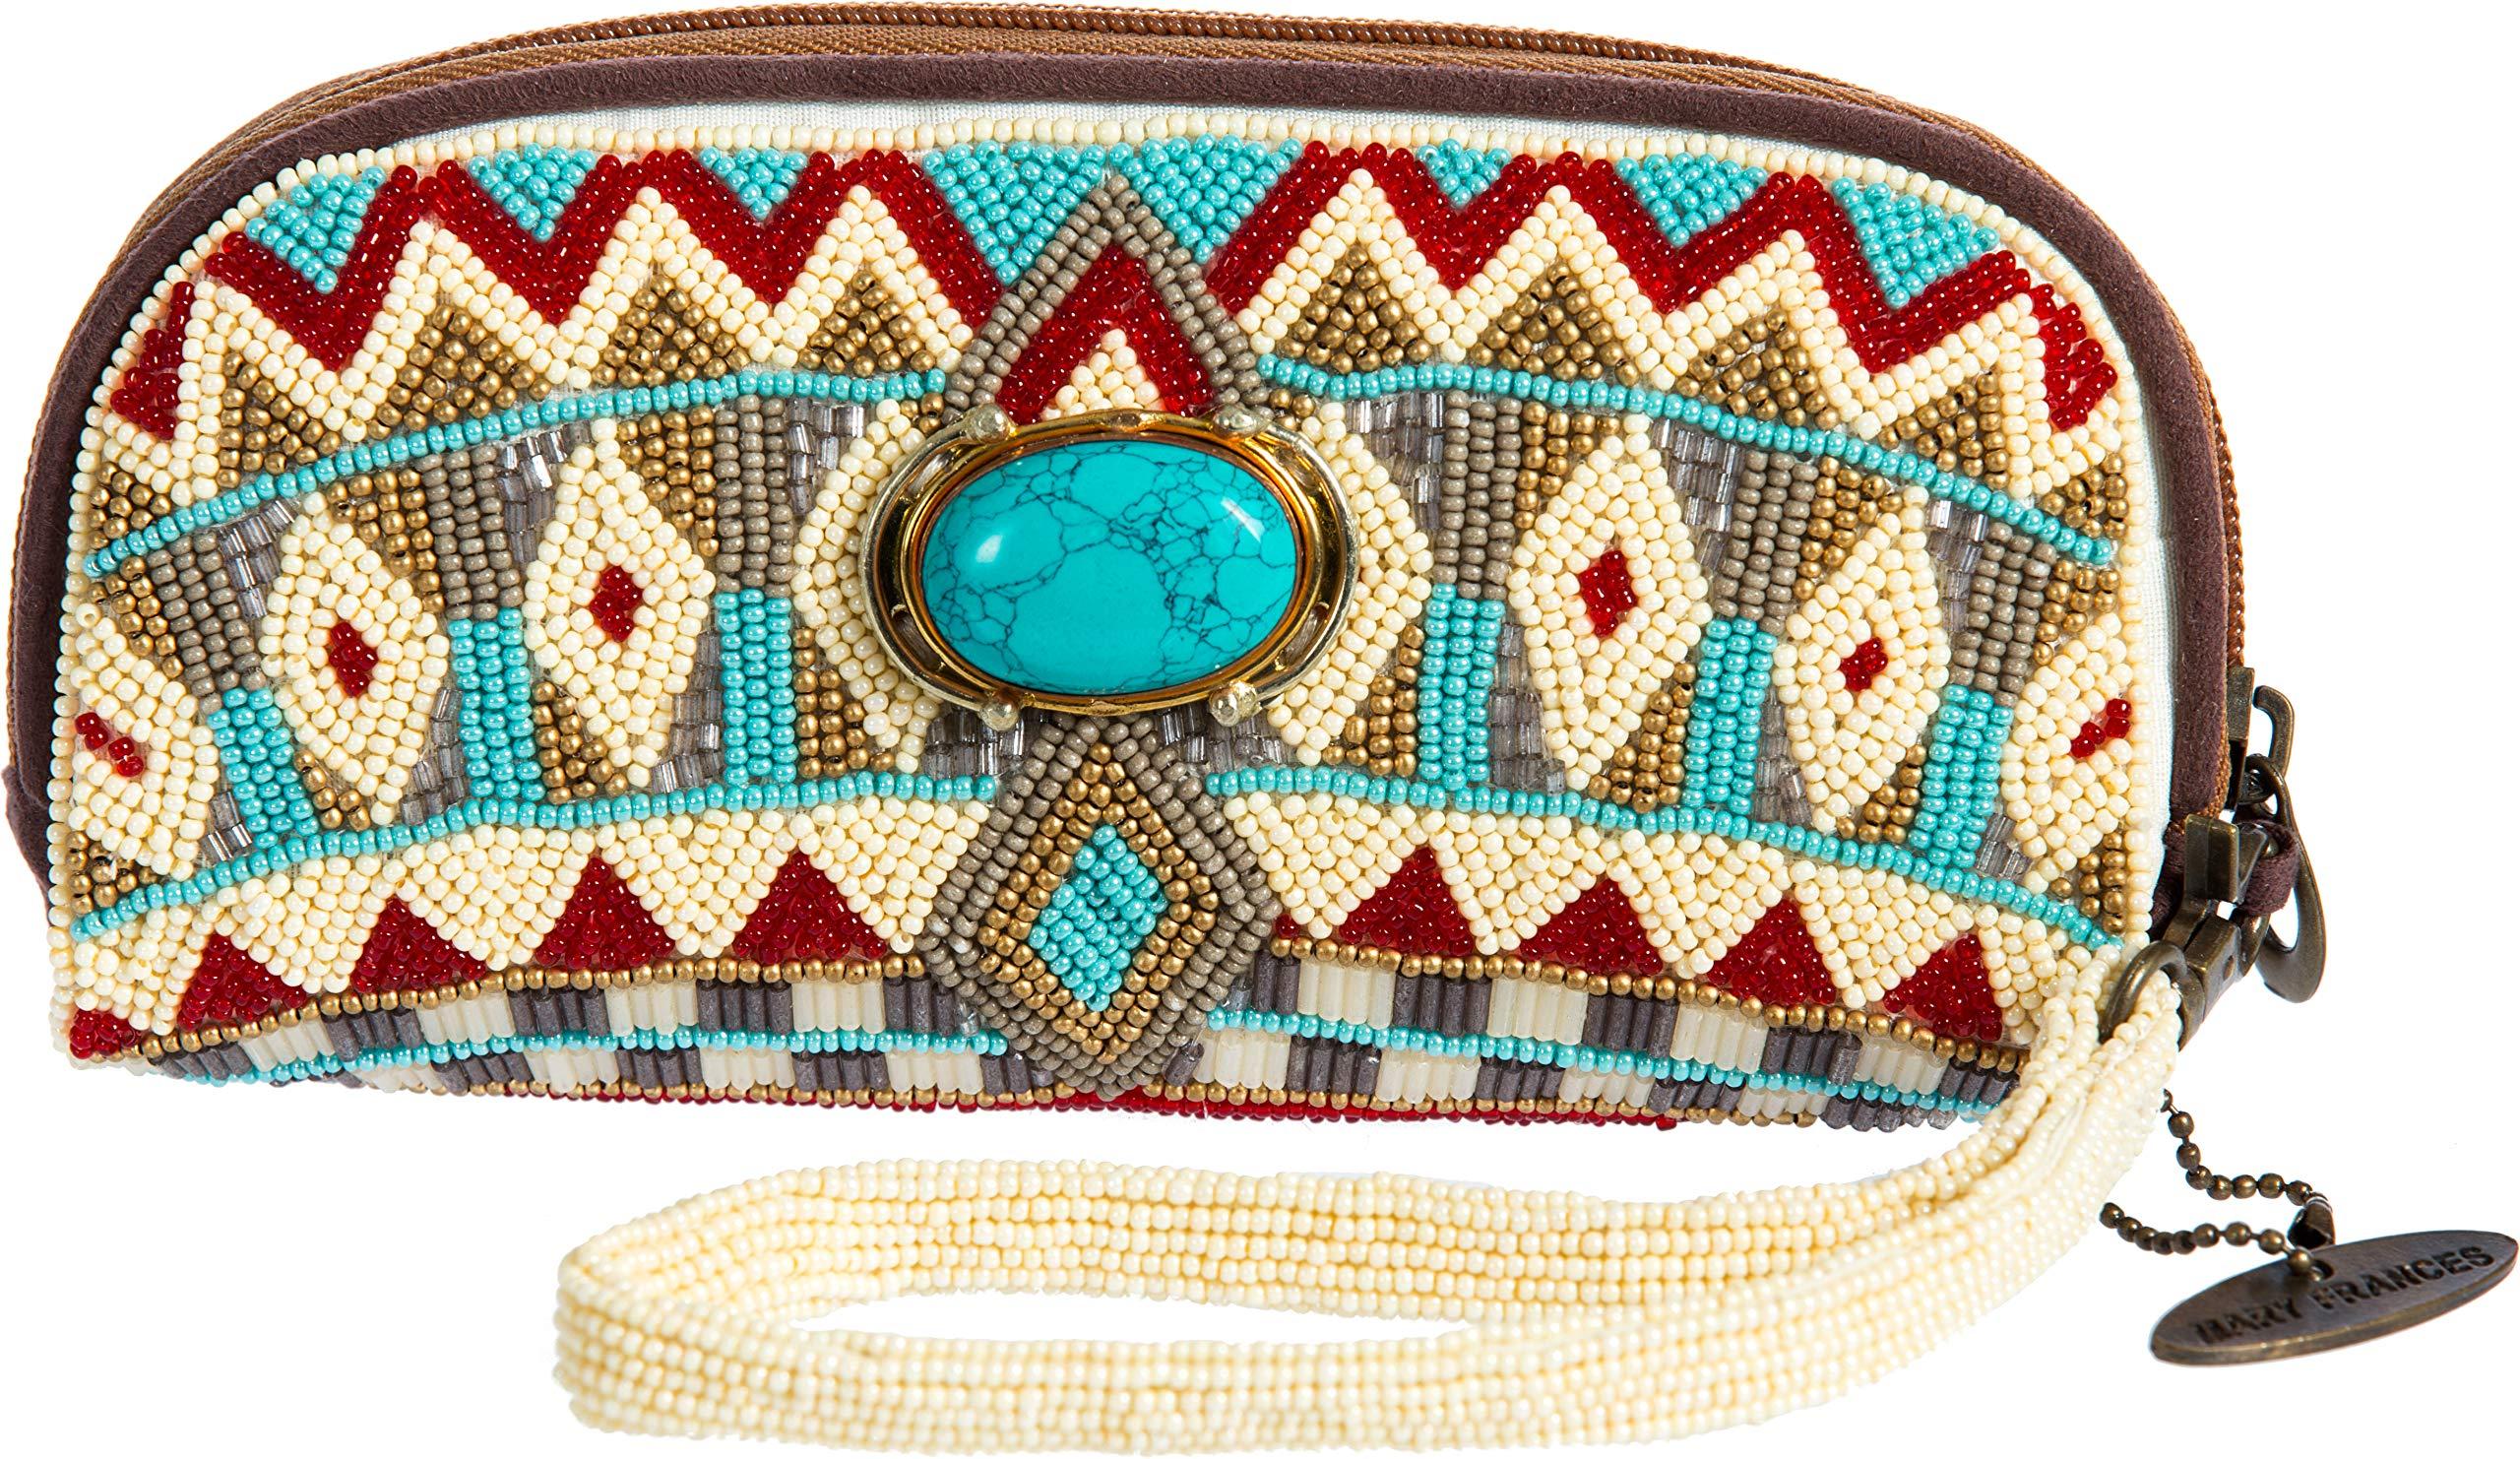 Mary Frances Turquoise Power Eye Glass Cases / Wristlet Handbag